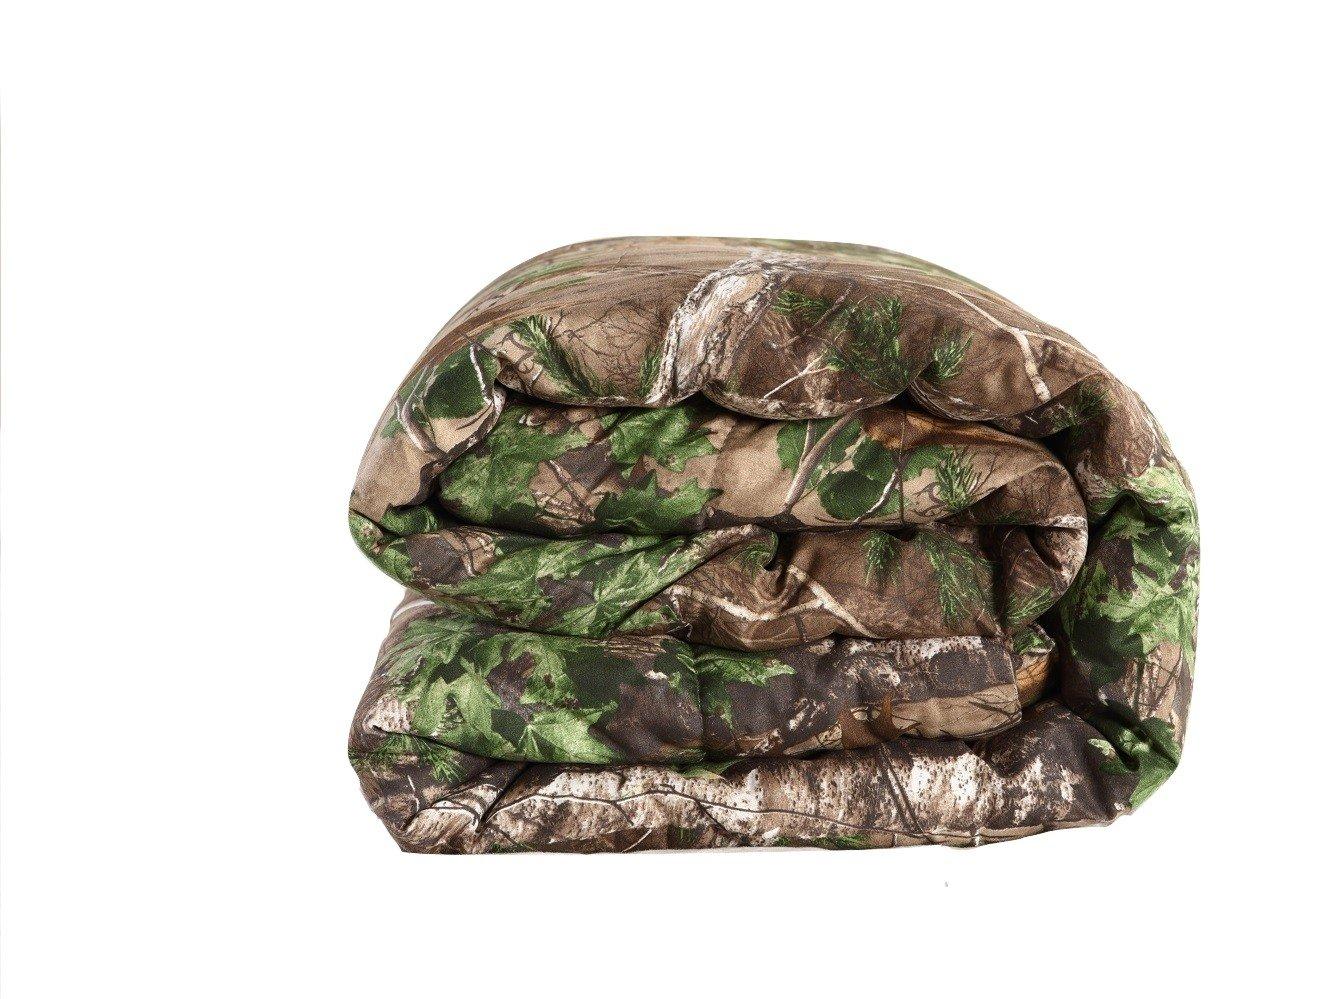 REALTREE Xtra Green micro peach super soft printed Comforter (TWIN)